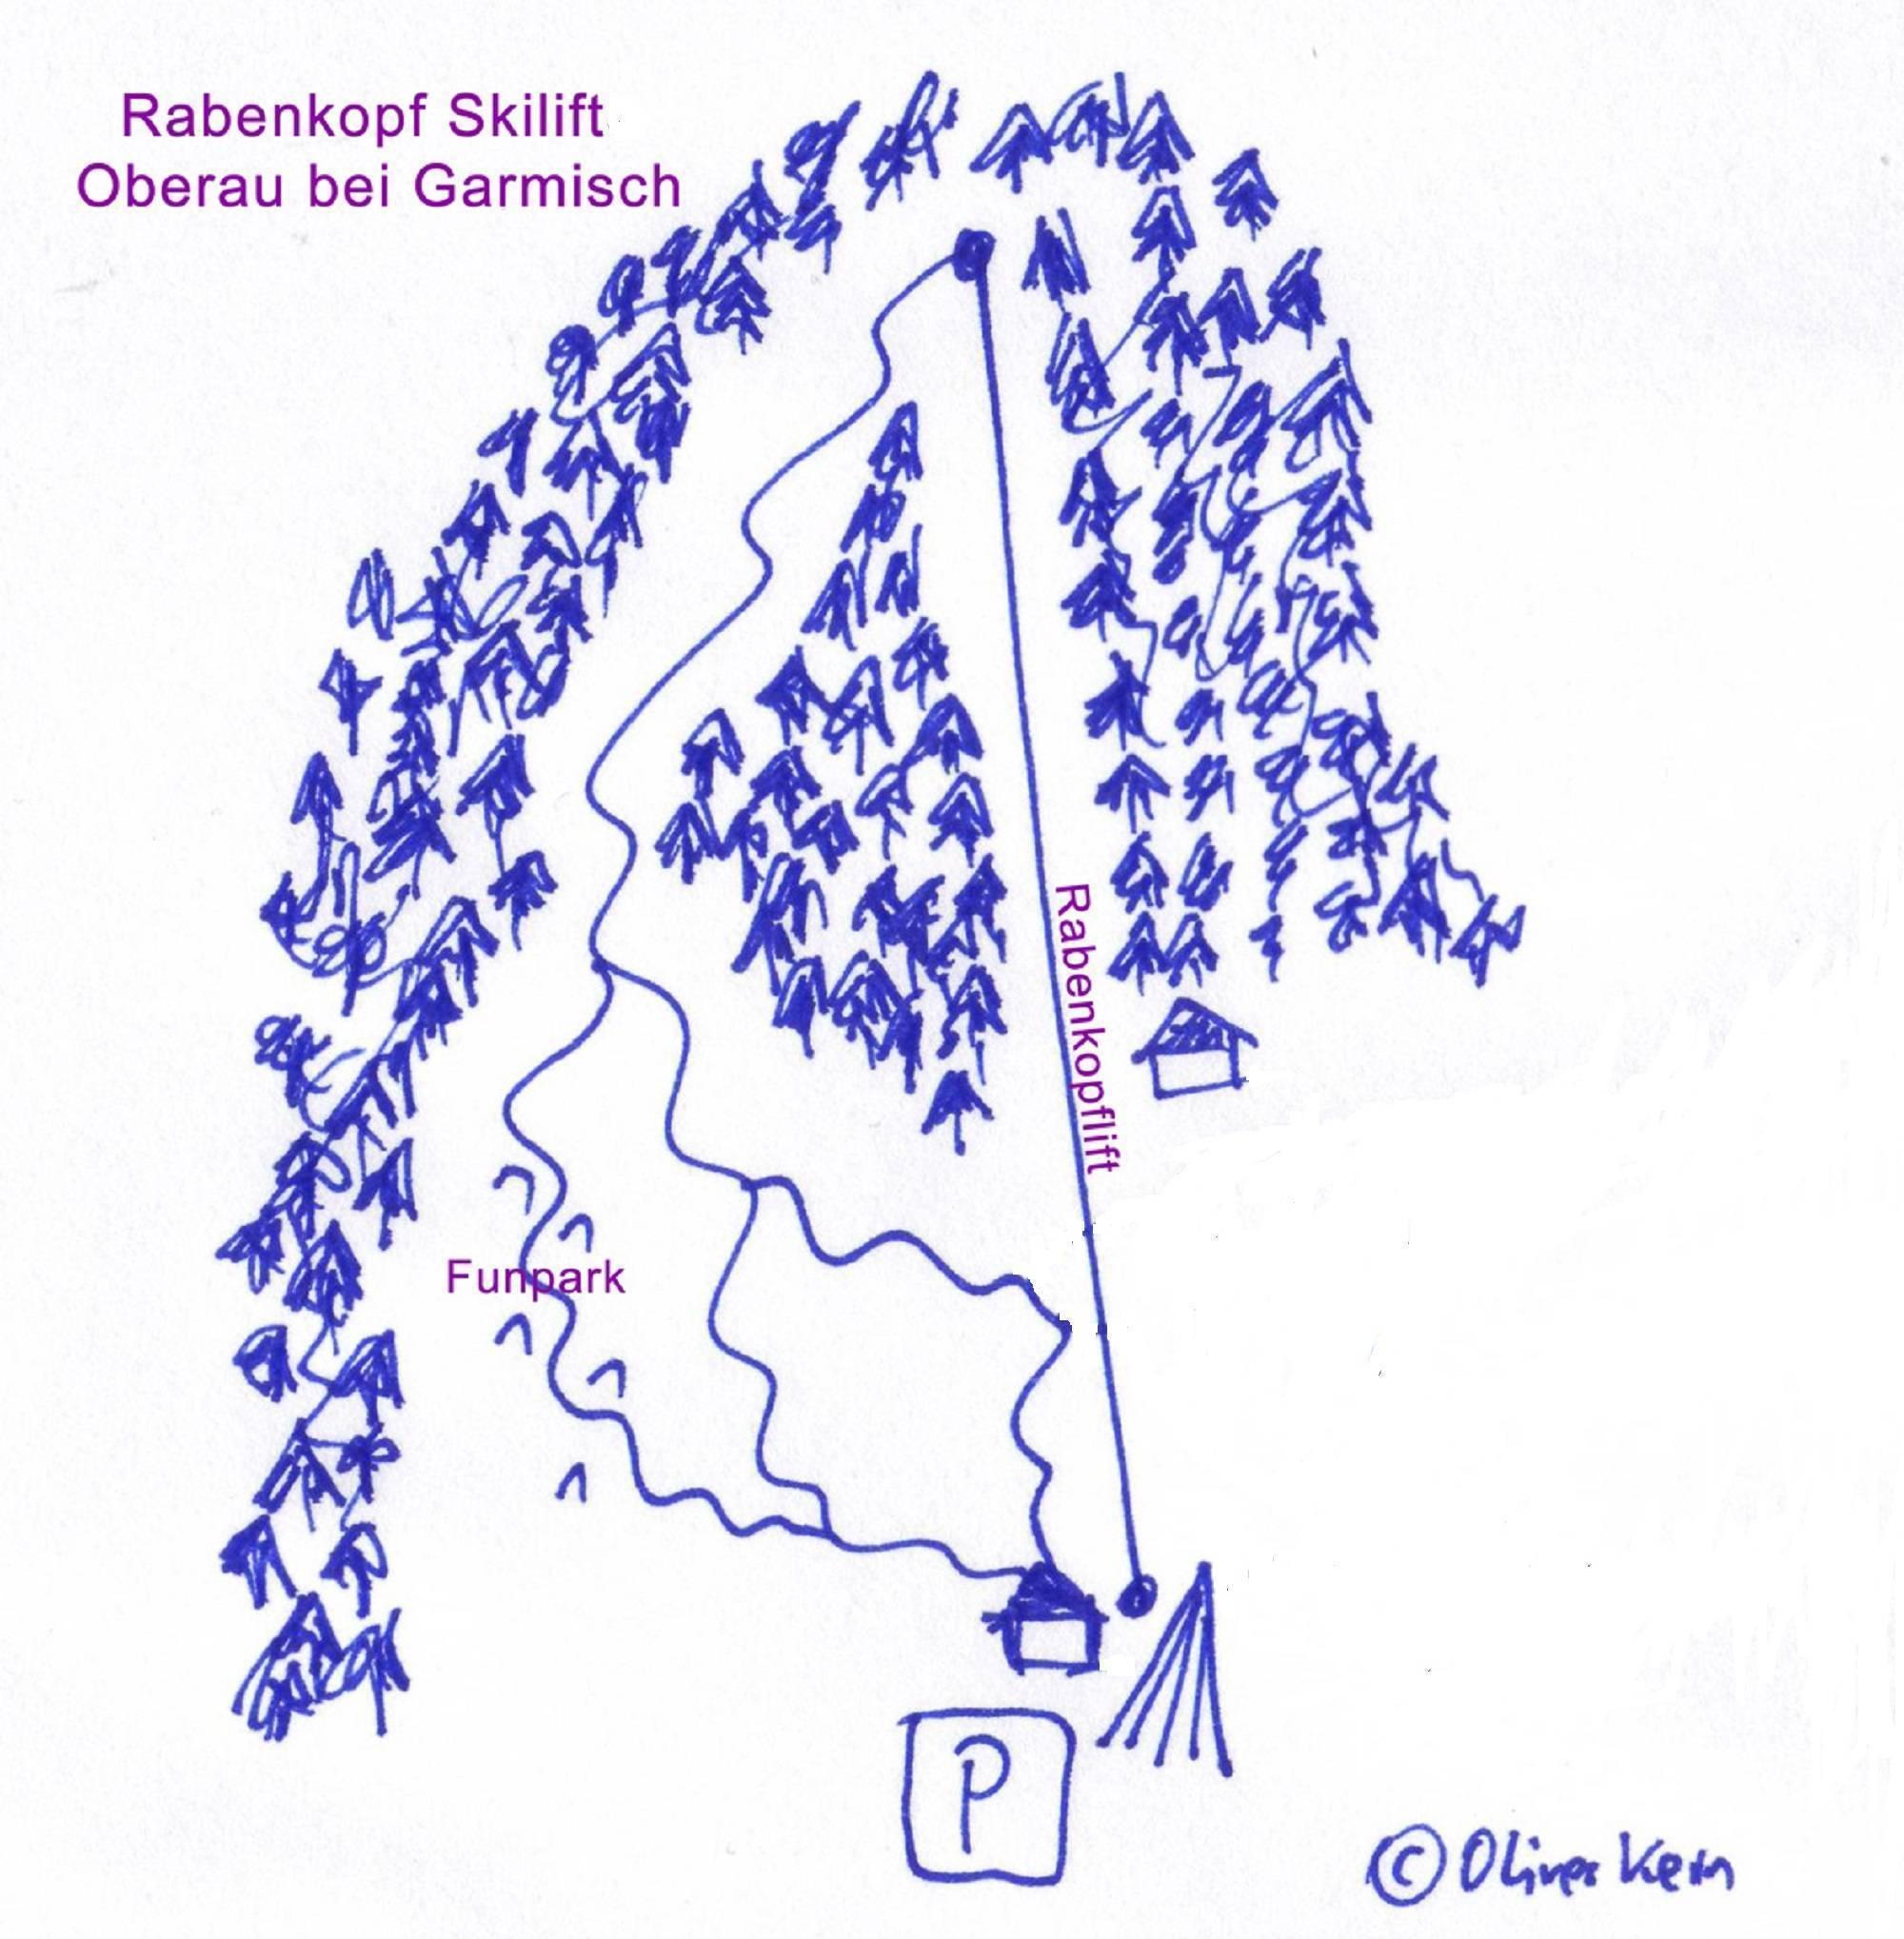 Rabenkopf – Oberau